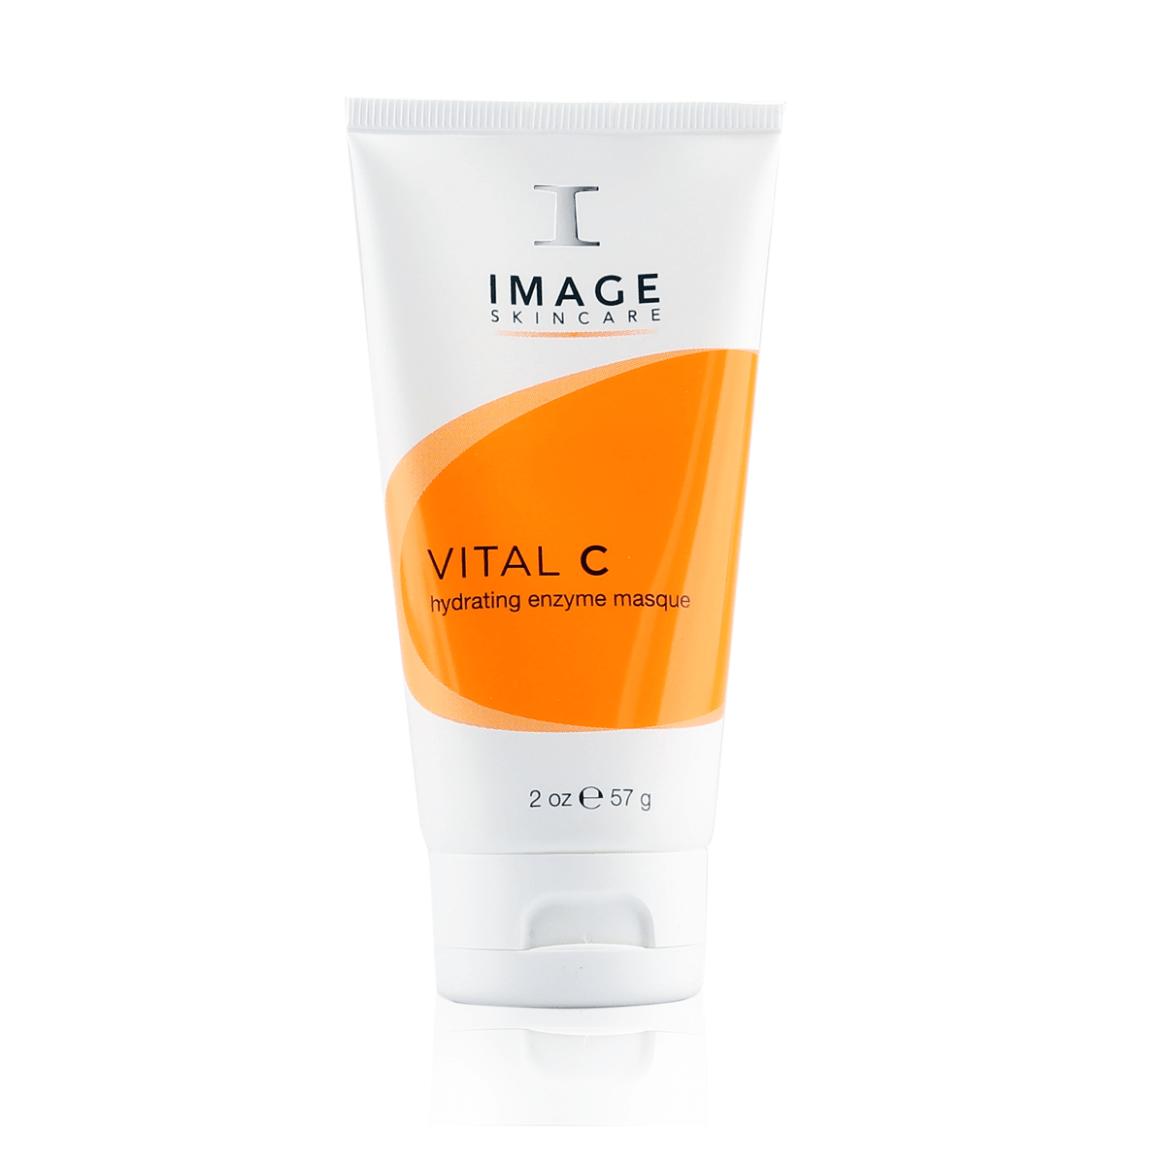 IMAGE VITAL C enzyme hydrating face mask